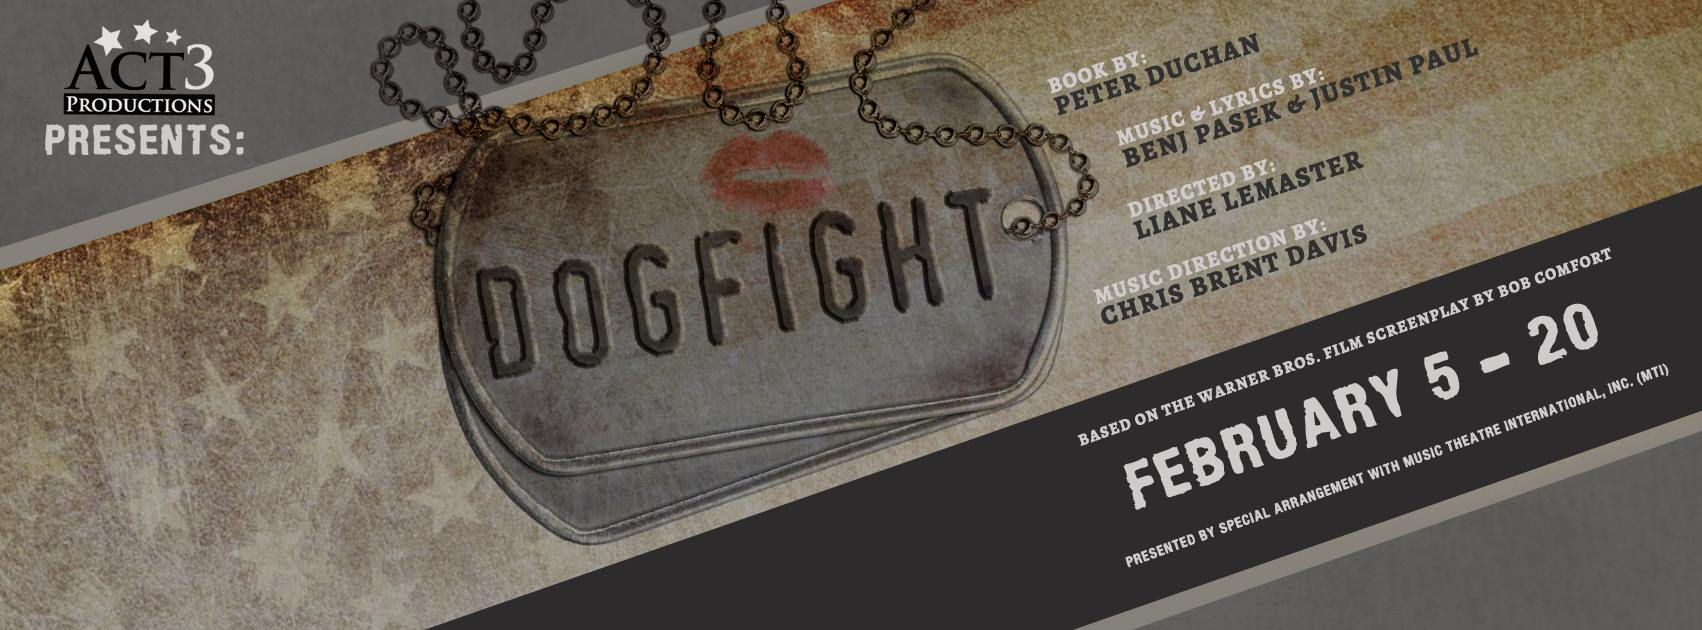 Dogfight_Act3Productions_SandySprings_Atlanta_musical.jpg